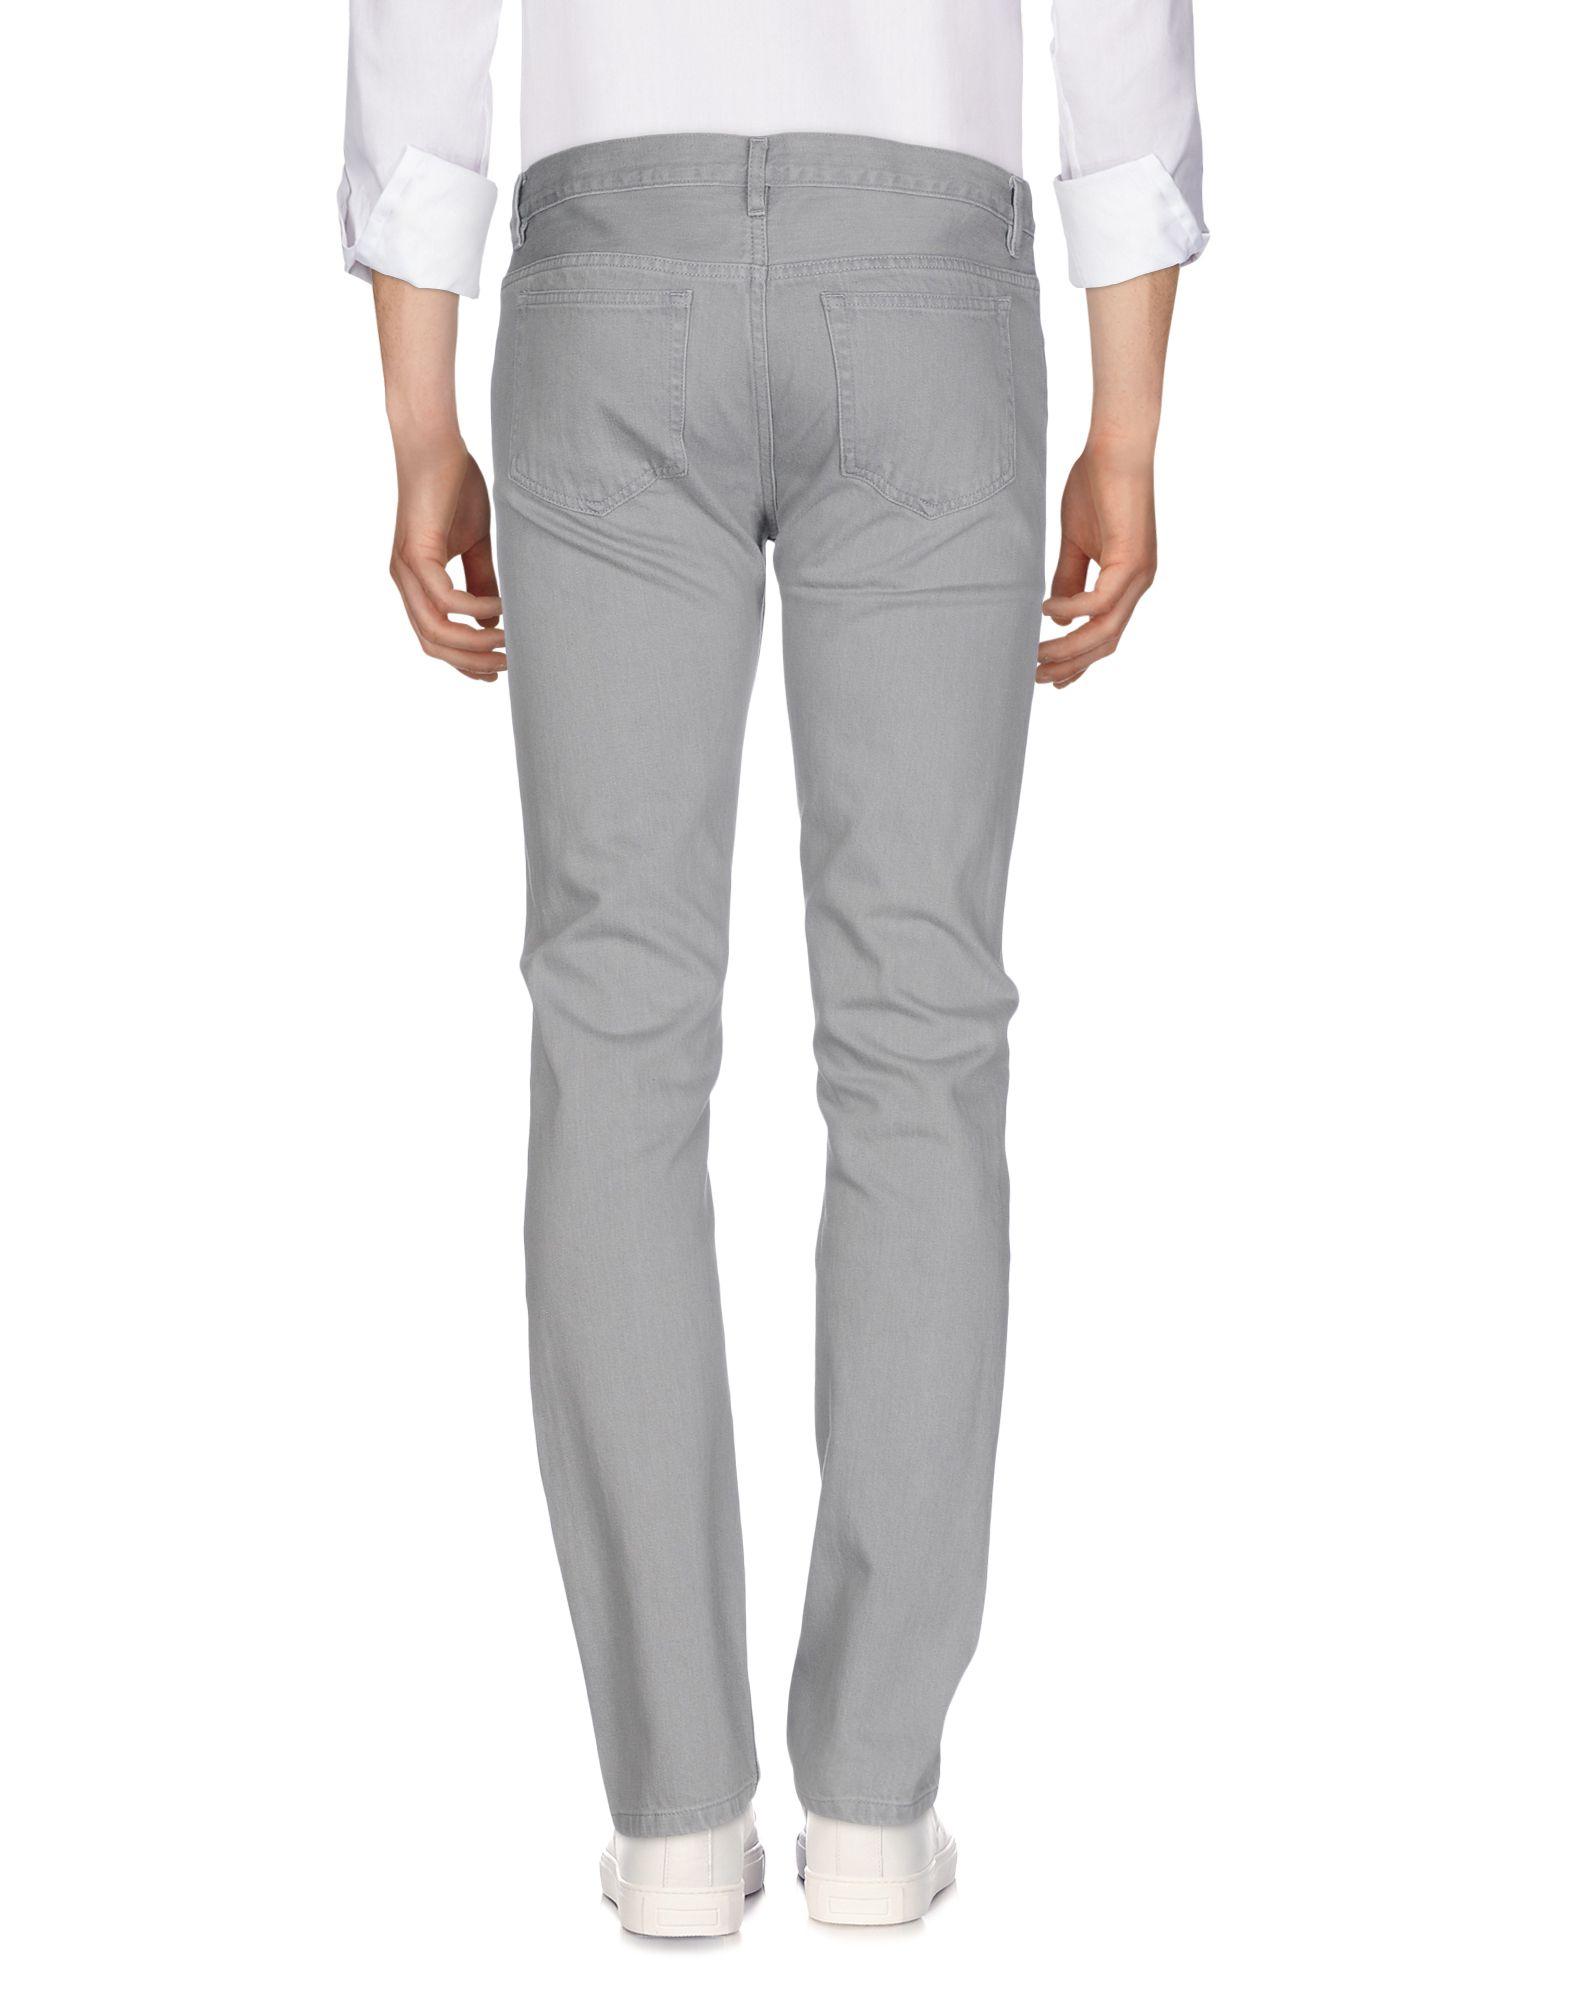 Pantaloni Jeans A.P.C. Uomo Uomo A.P.C. - 42658030FX 0f408d